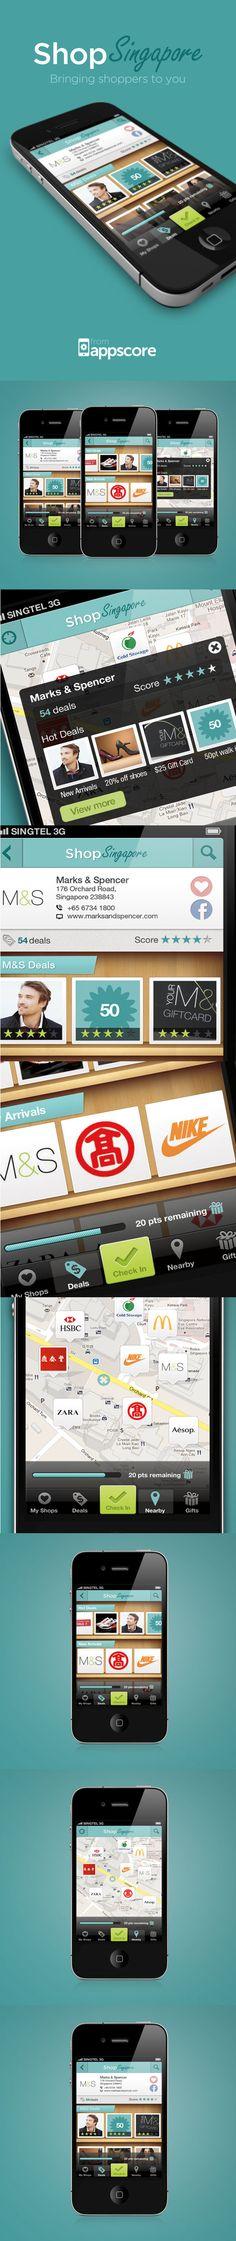 Shop Singapore iPhone application design by Mike Thomas, via Behance